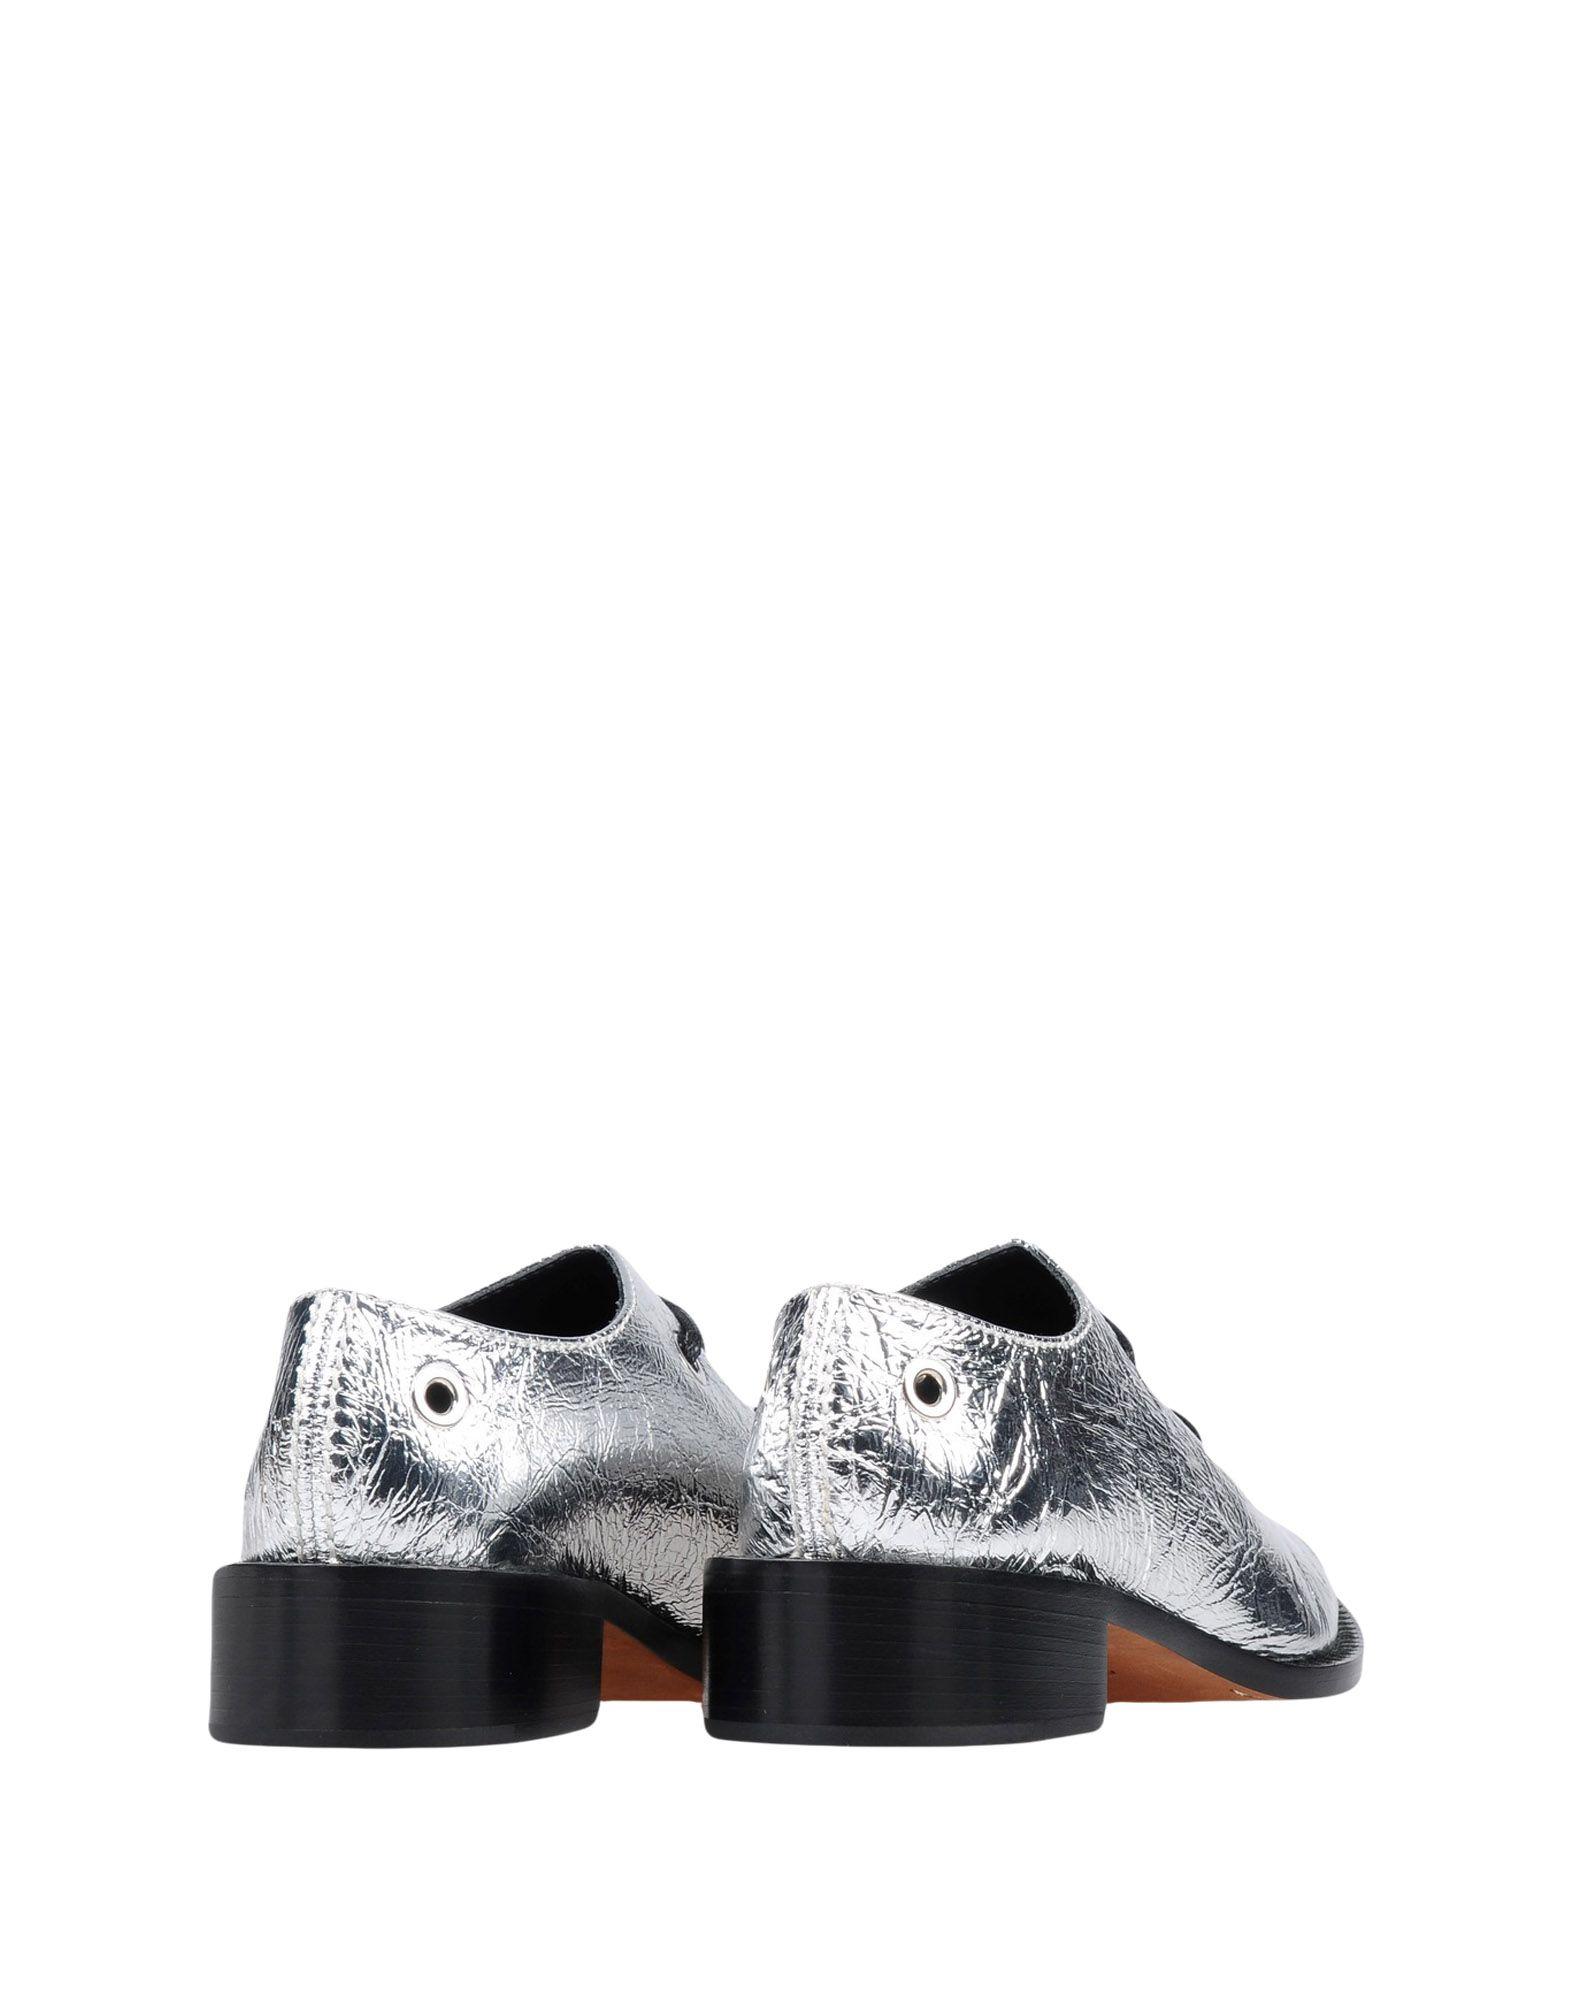 Proenza Proenza Proenza Schouler Schnürschuhe Damen  11488693HT Beliebte Schuhe 3e4455